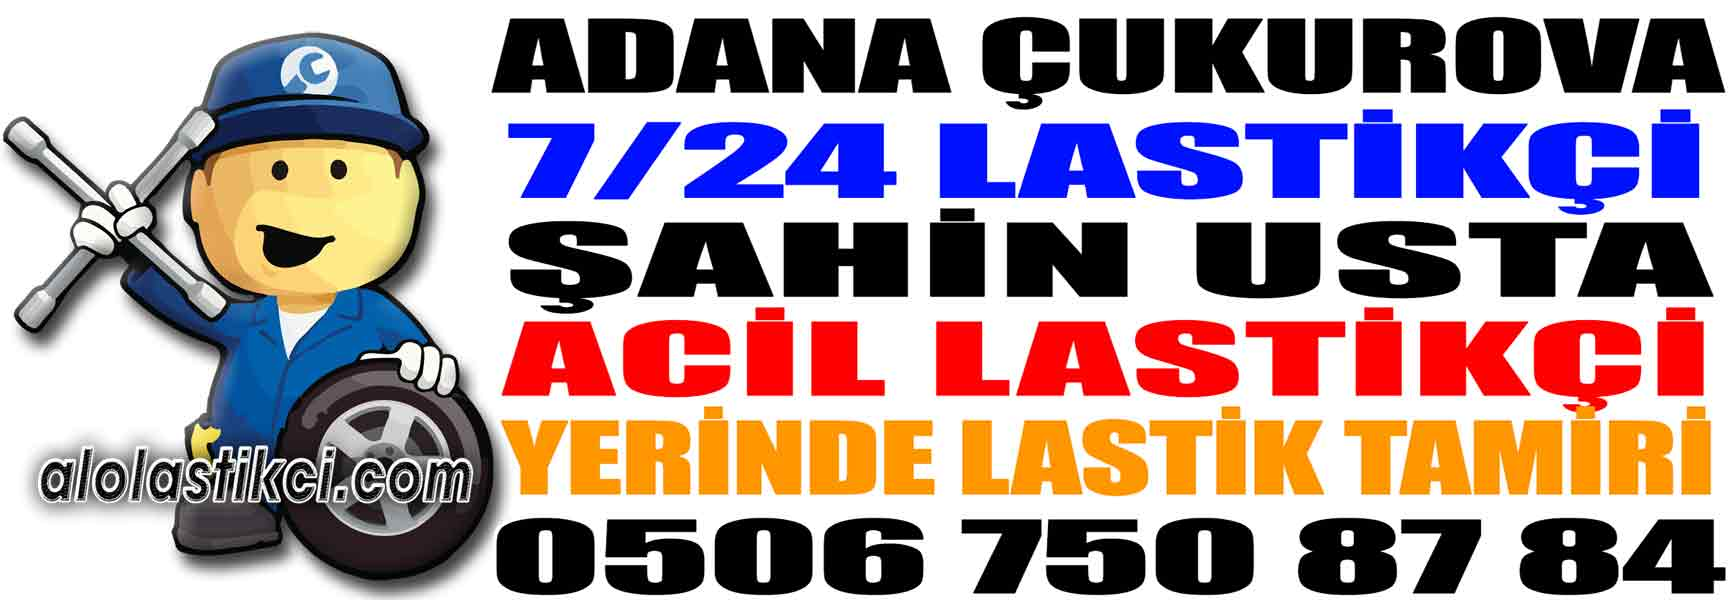 Adana Çukurova Lastikçi